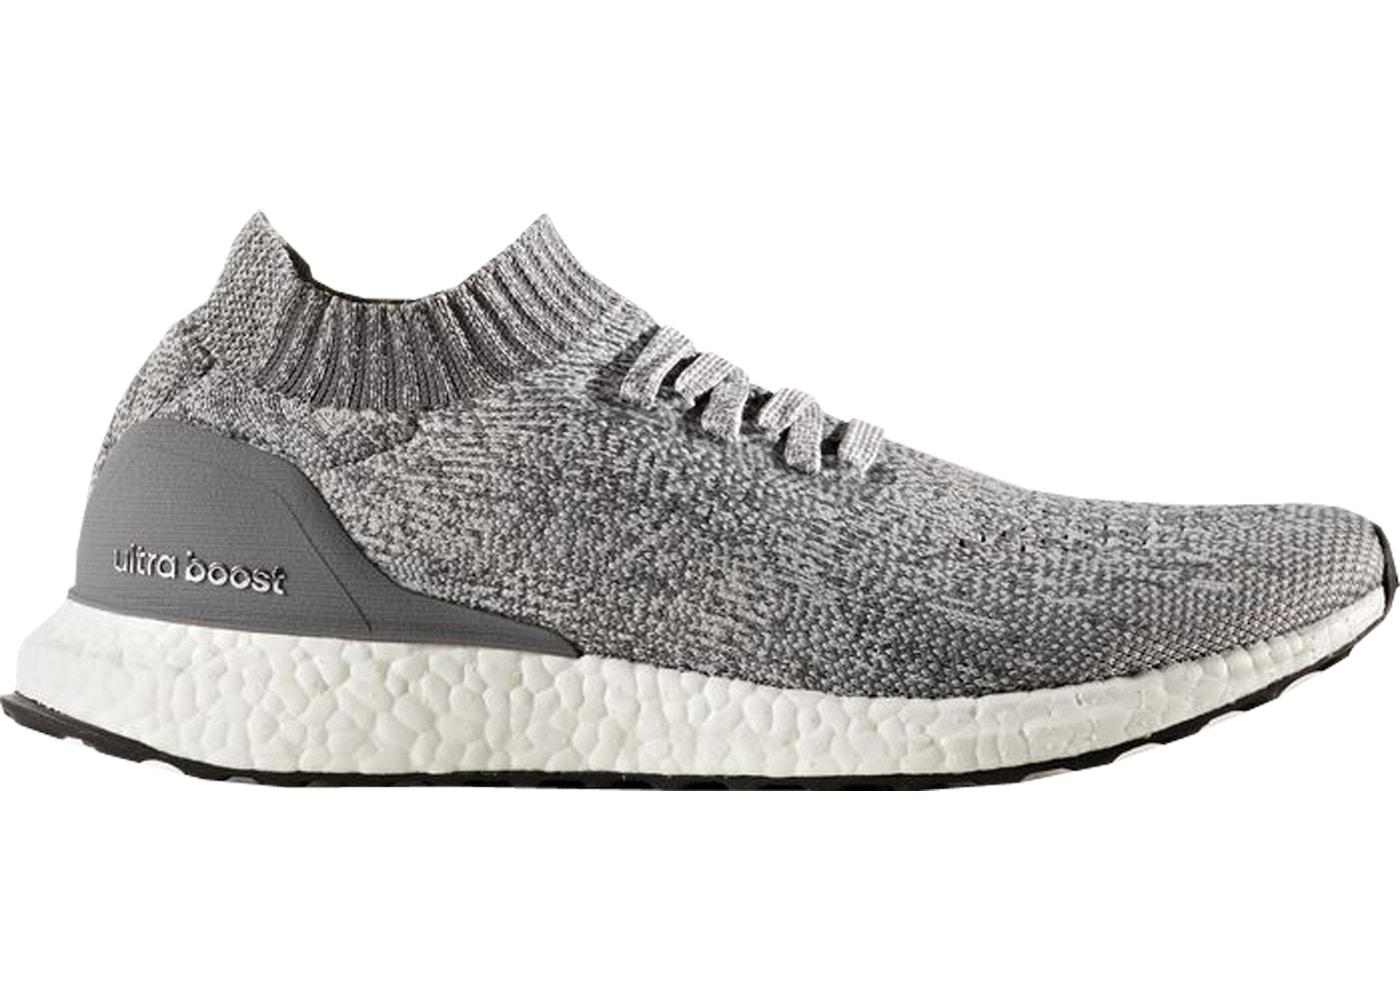 adidas Ultra Boost Uncaged Light Grey